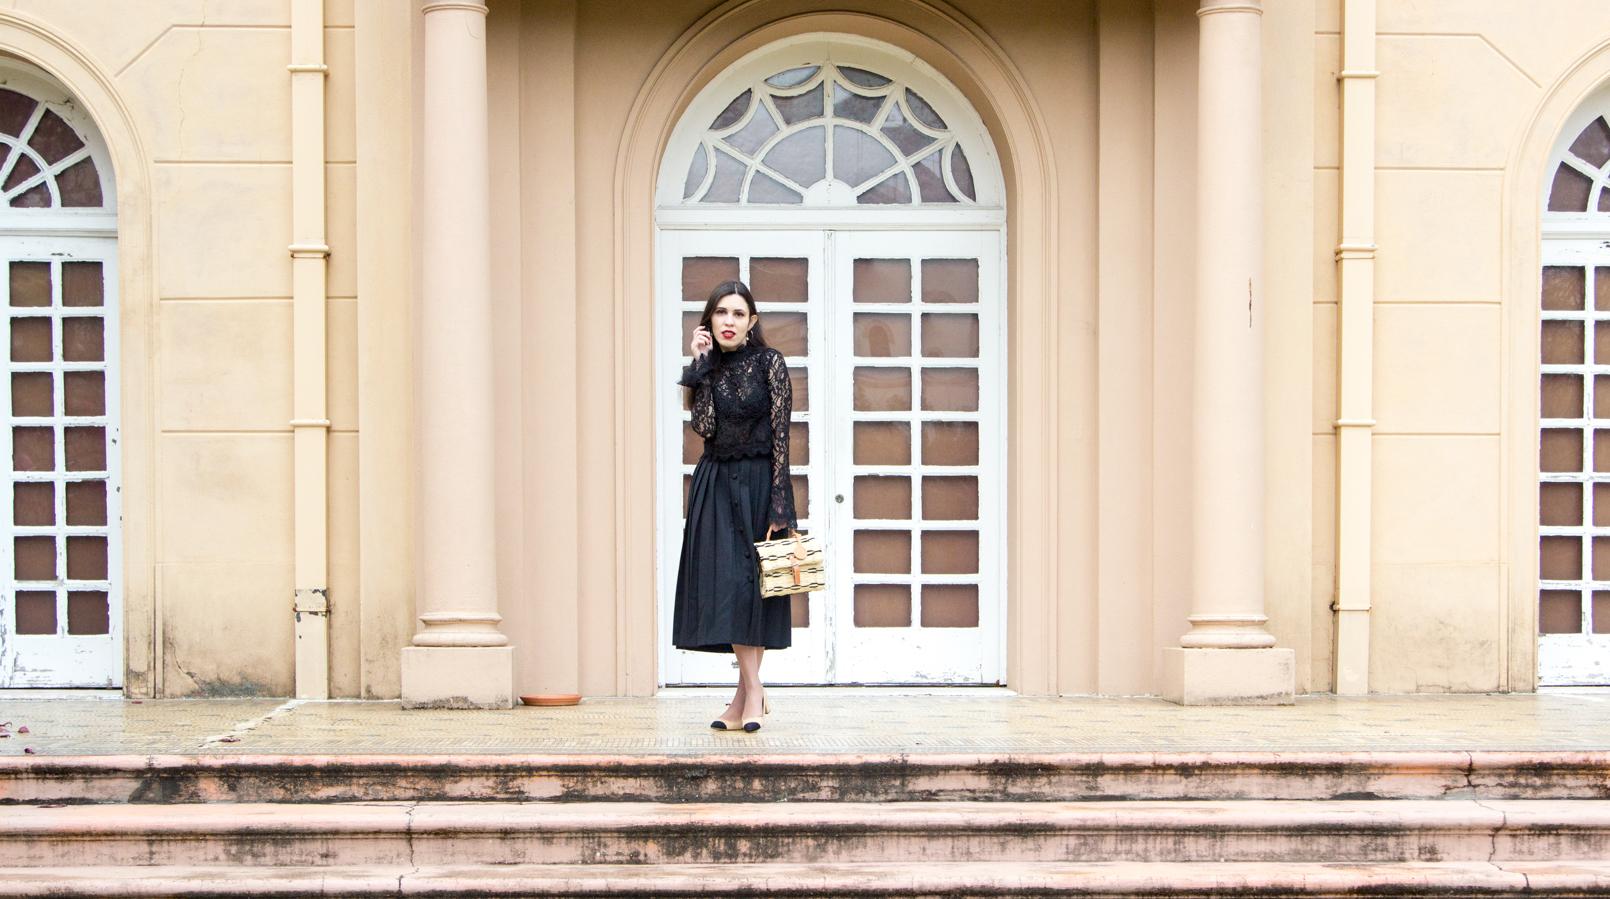 Le Fashionaire Uma saia com história saia midi preta pregas rodada vintage botoes blusa preta renda transparente zara cesta verga preta bege toino abel fivela pele 7052F PT